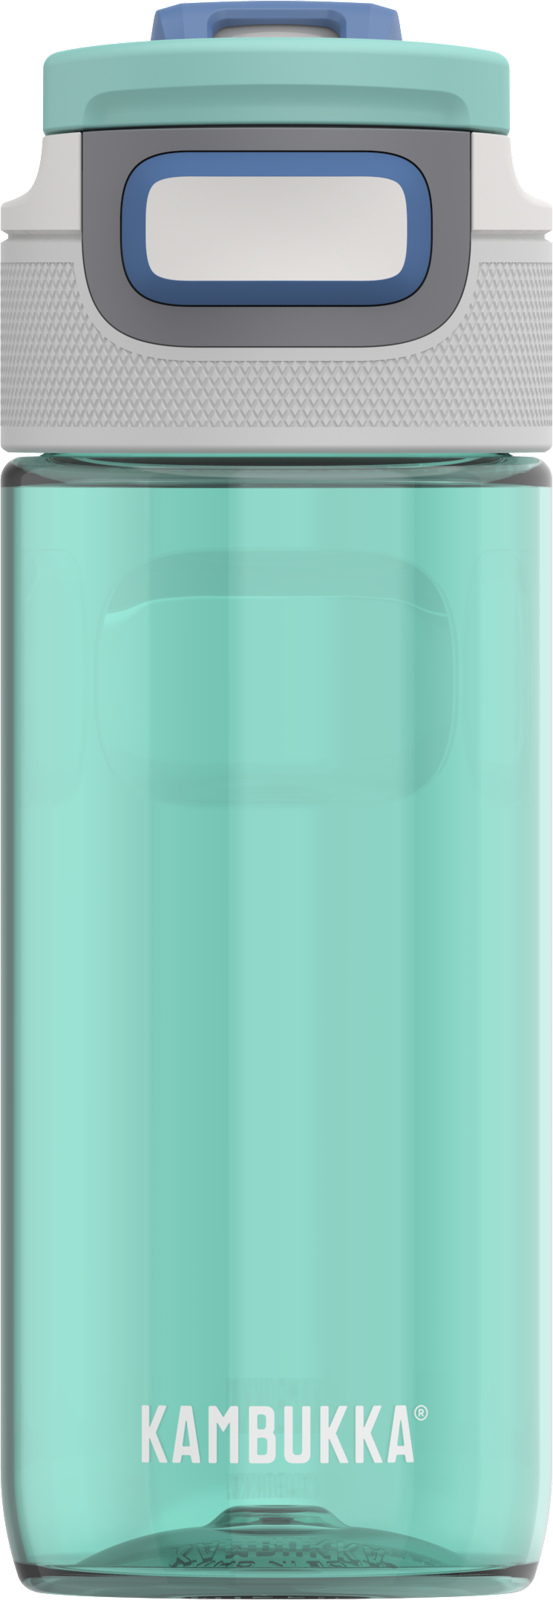 Butelka na wodę Kambukka Elton 500 ml - Misty Grey